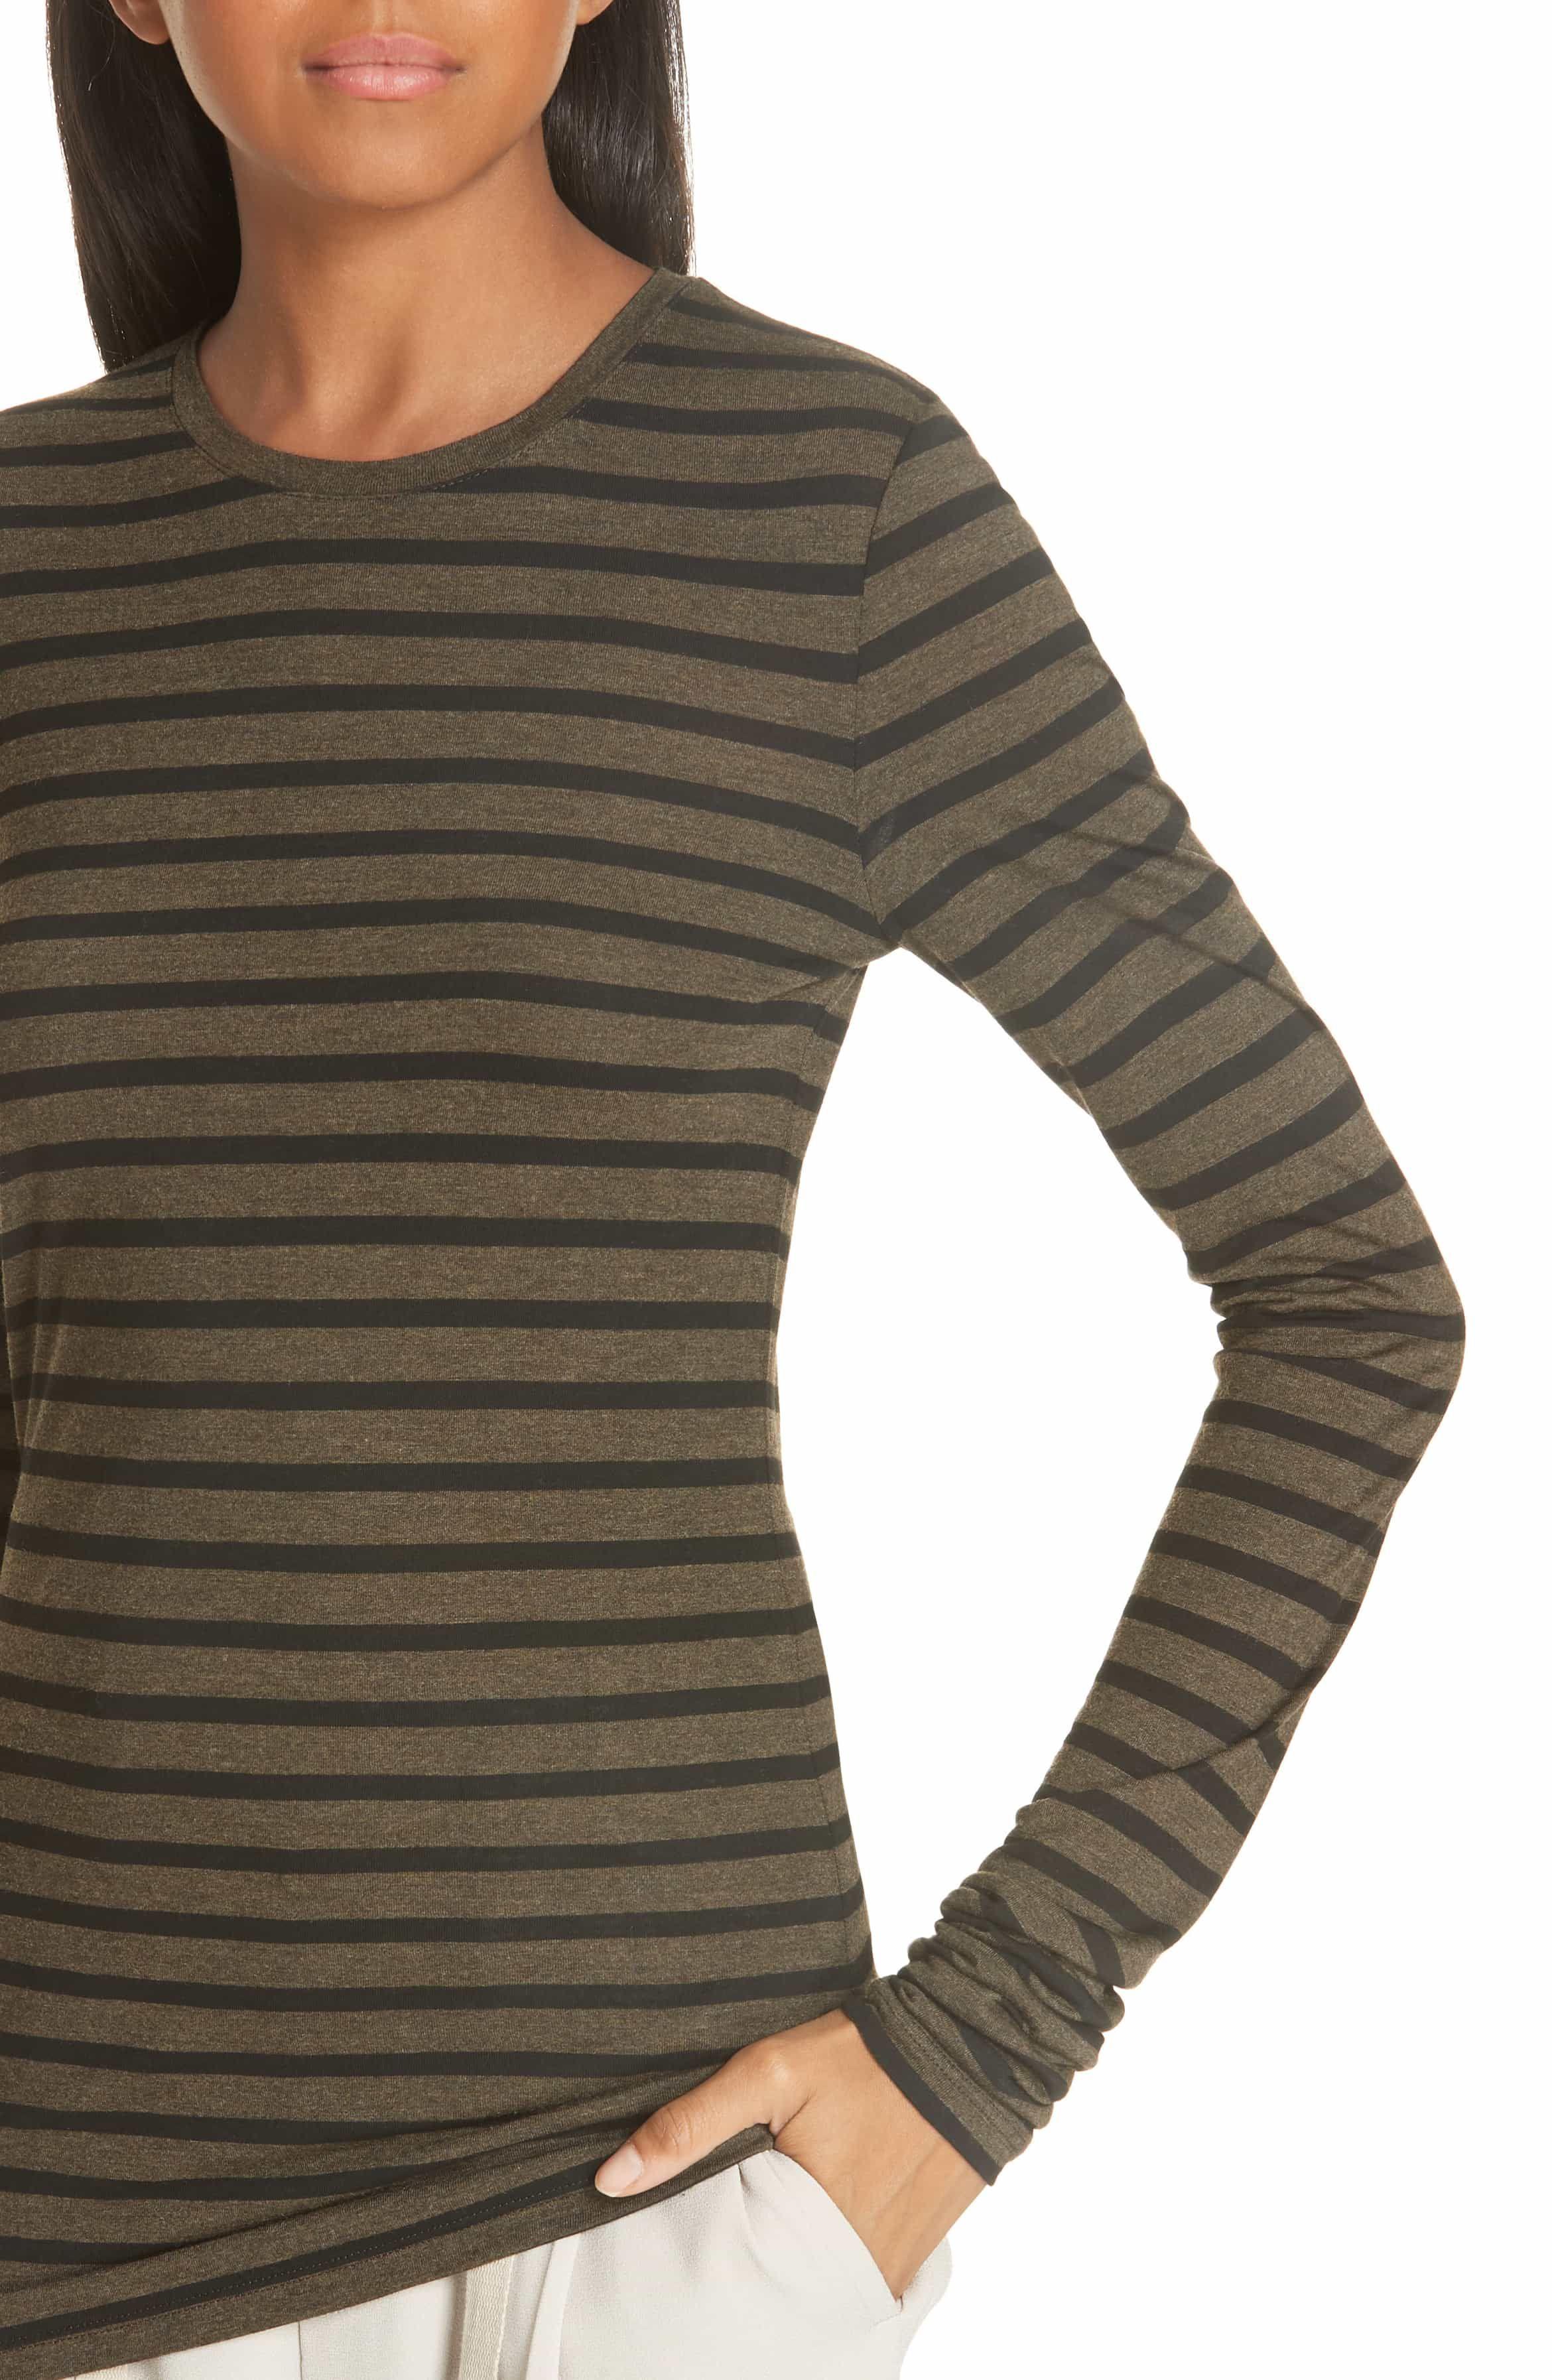 52d83aba5 Long Sleeve Tee Shirts · Heather Stripe Top